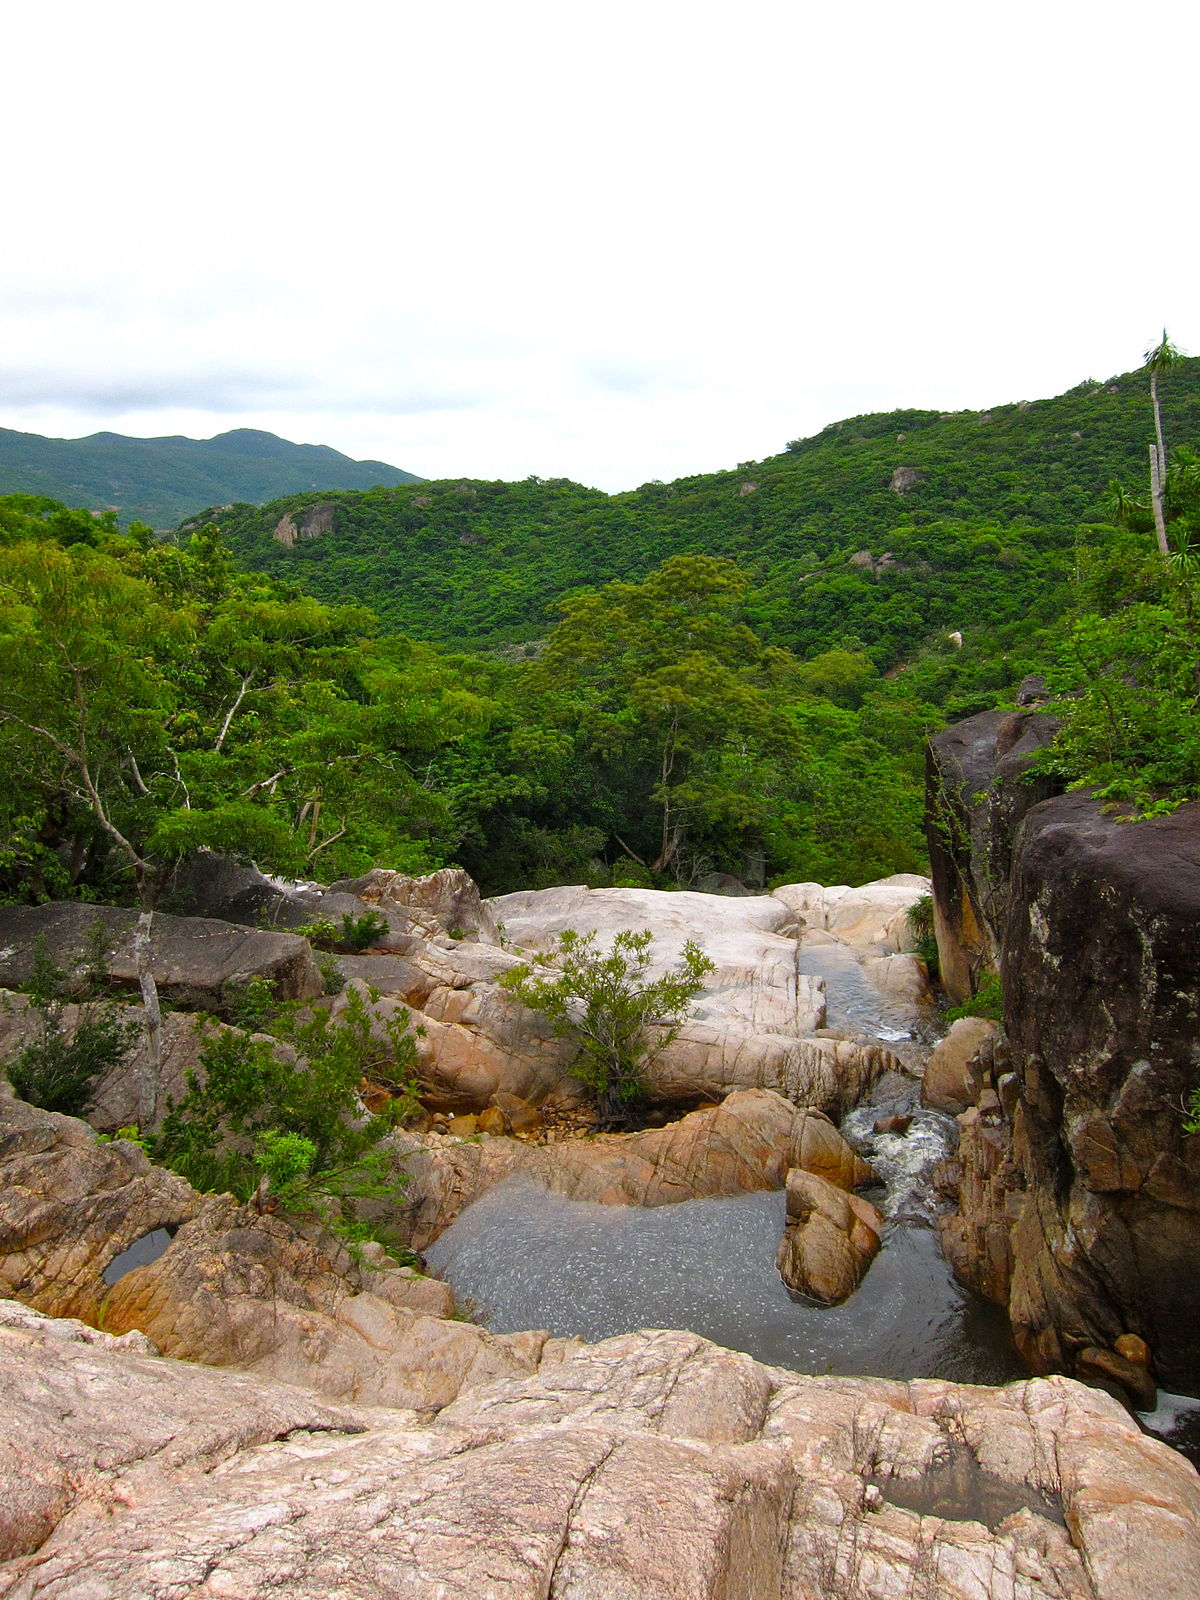 Núi Chúa National Park - Wikipedia